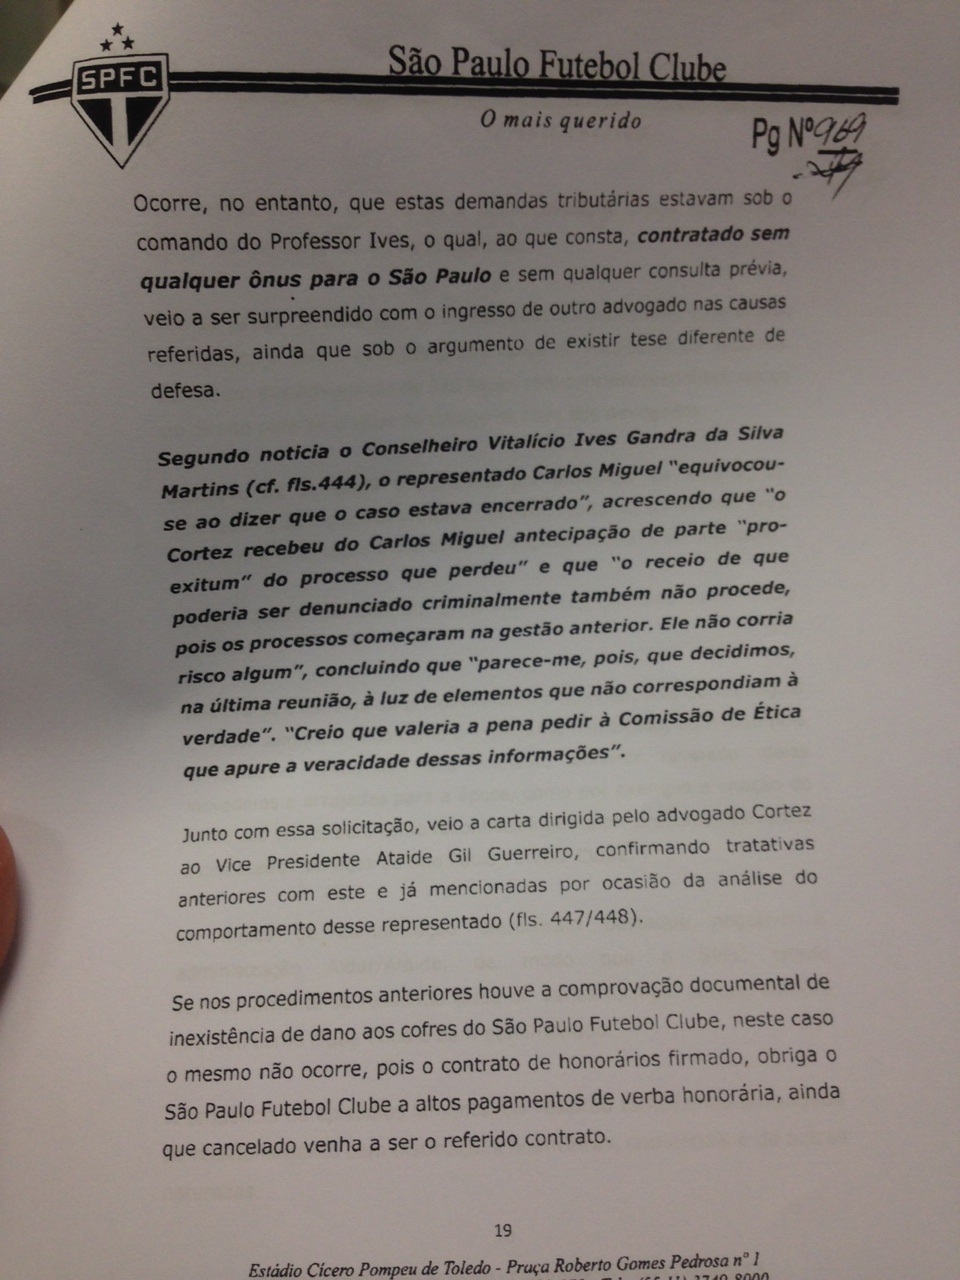 Comitê de Ética analisa conduta de Aidar em caso José Roberto Cortez